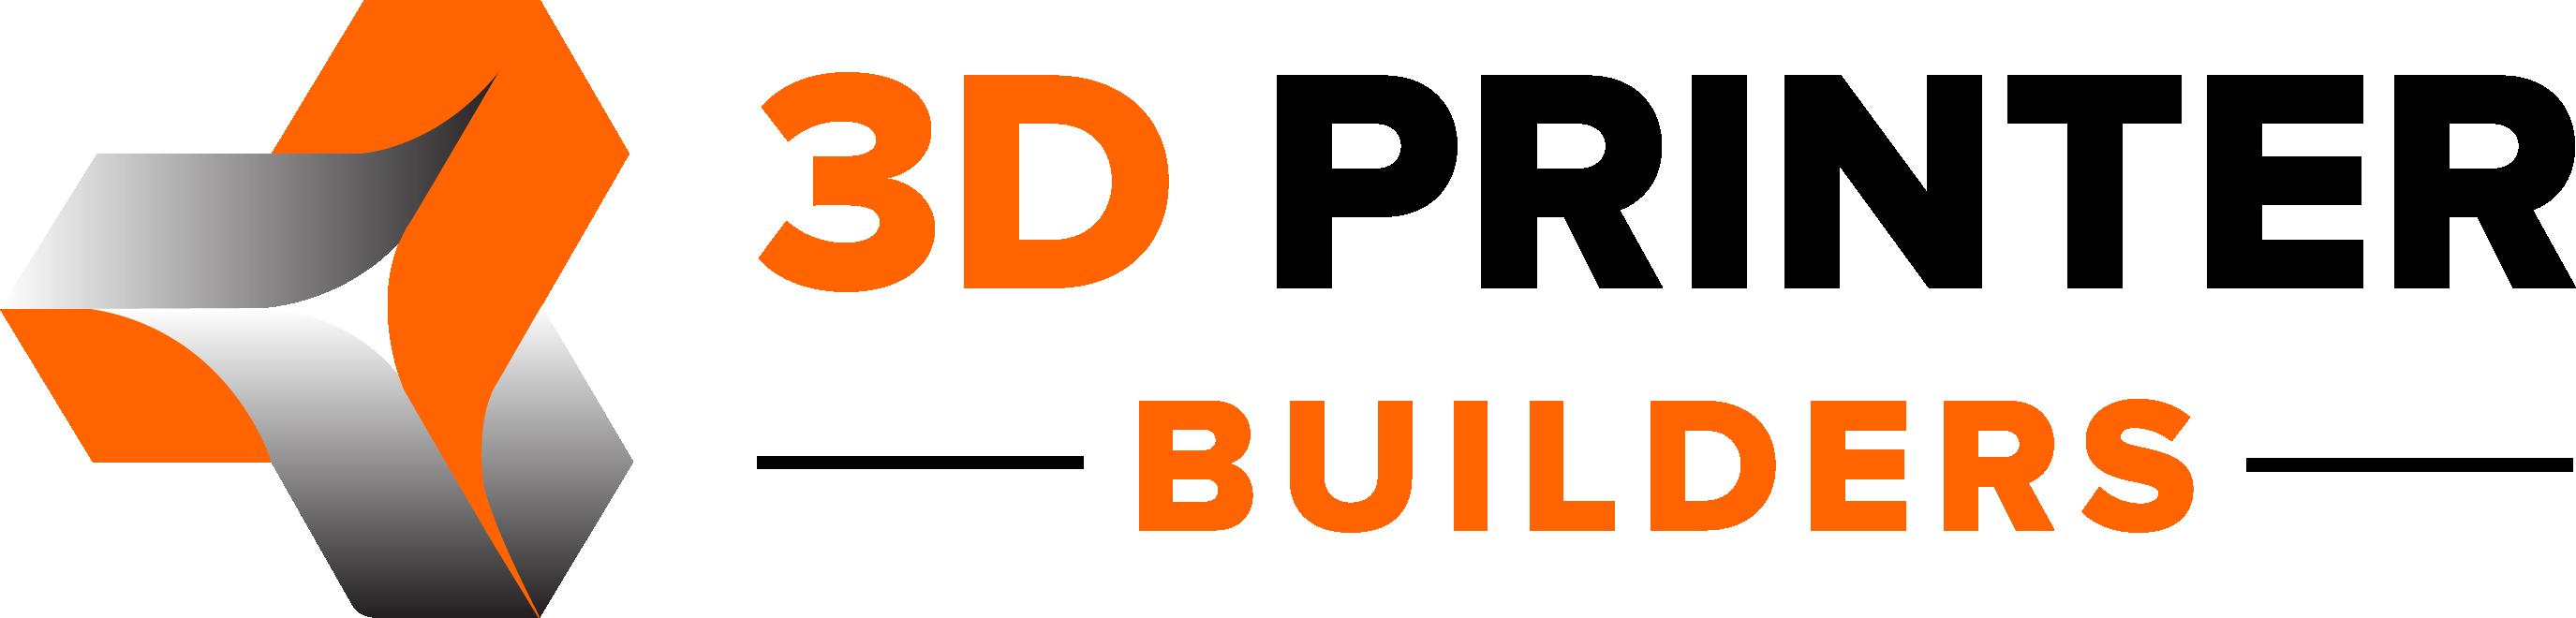 3dprinter.builders